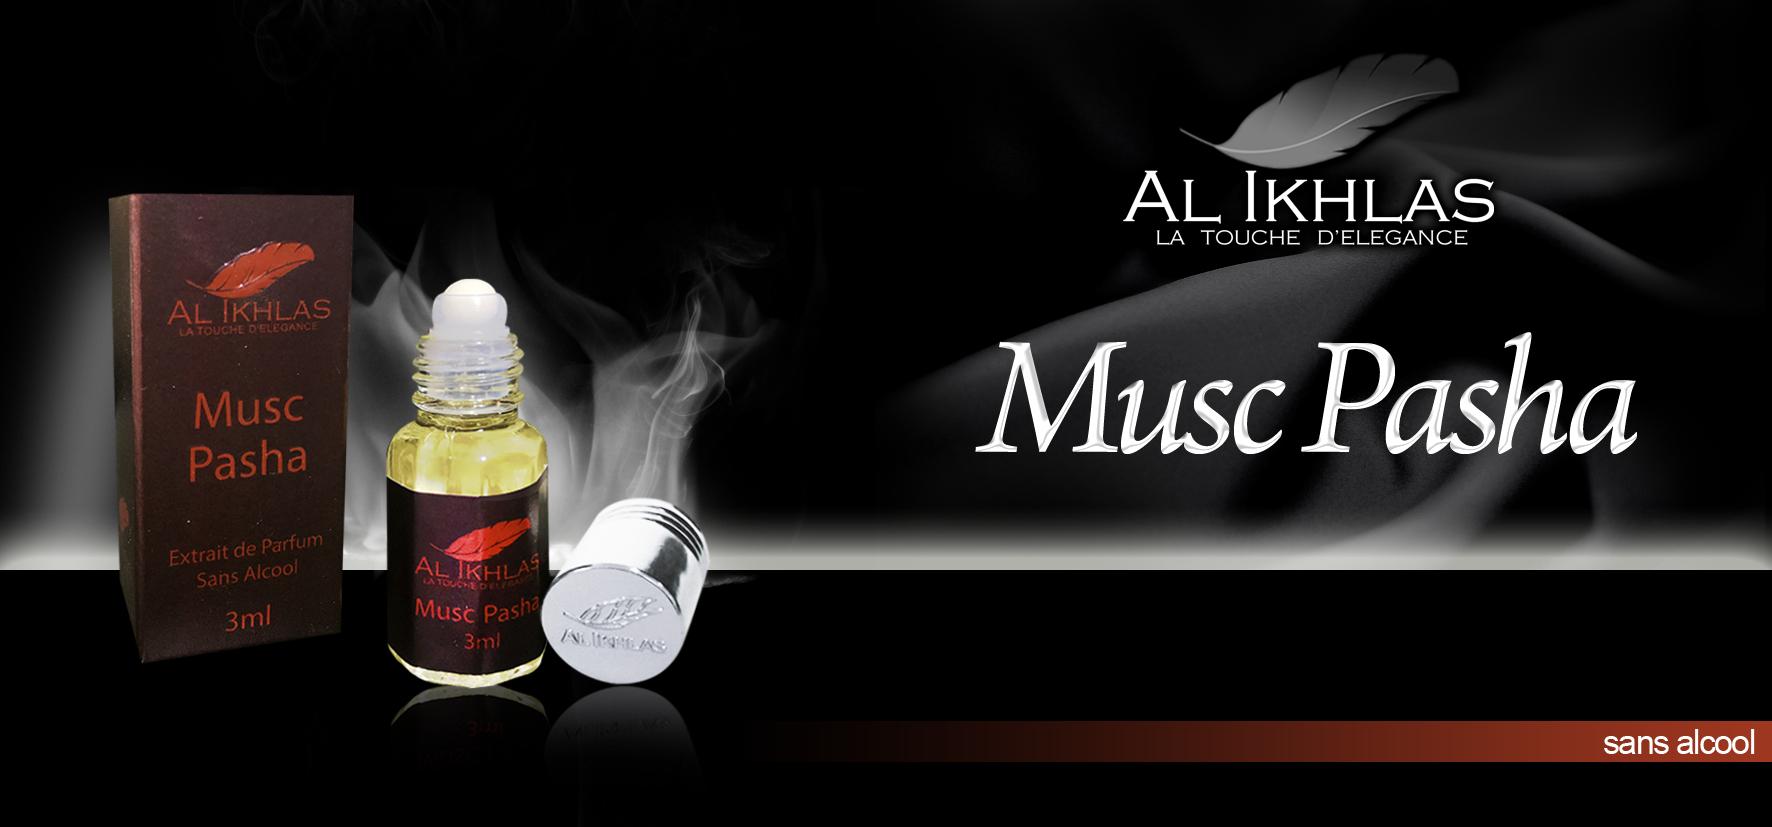 Al Ikhlas musc Pasha